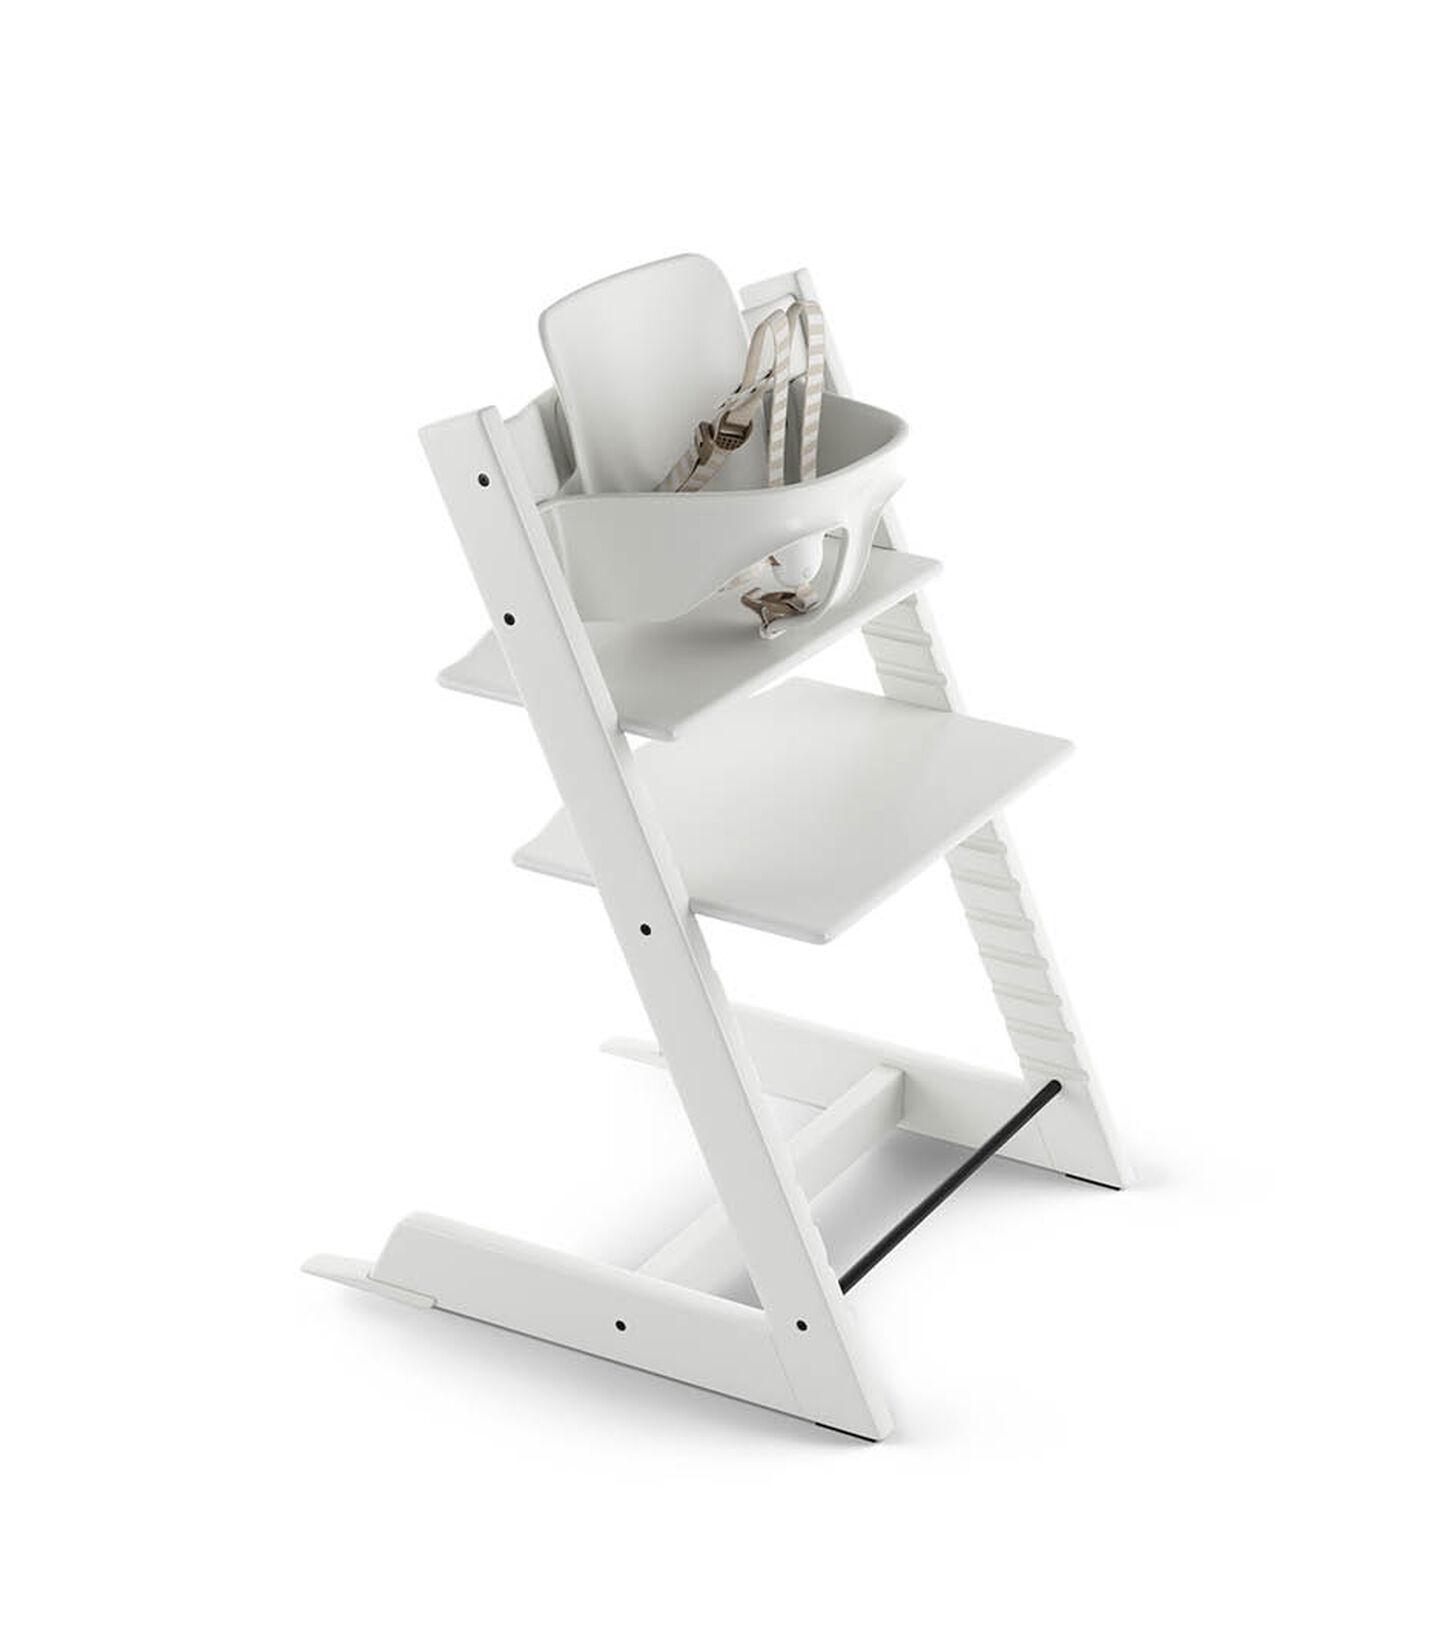 Tripp Trapp® Bundle High Chair US 18 White, White, mainview view 1